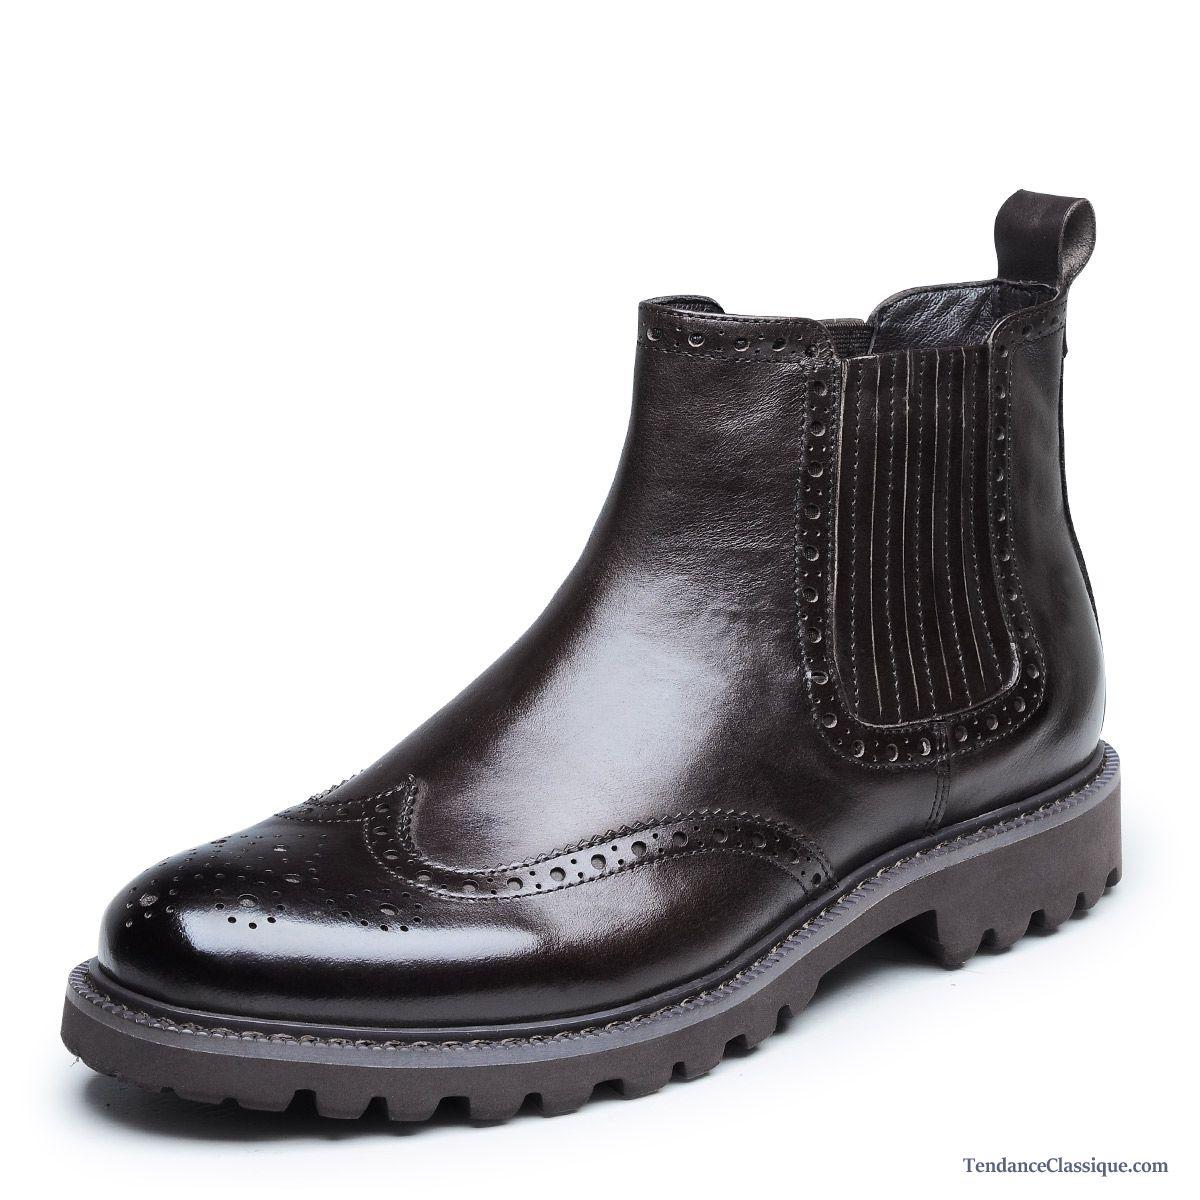 bottes homme en cuir bisque bottes cuir homme pas cher. Black Bedroom Furniture Sets. Home Design Ideas